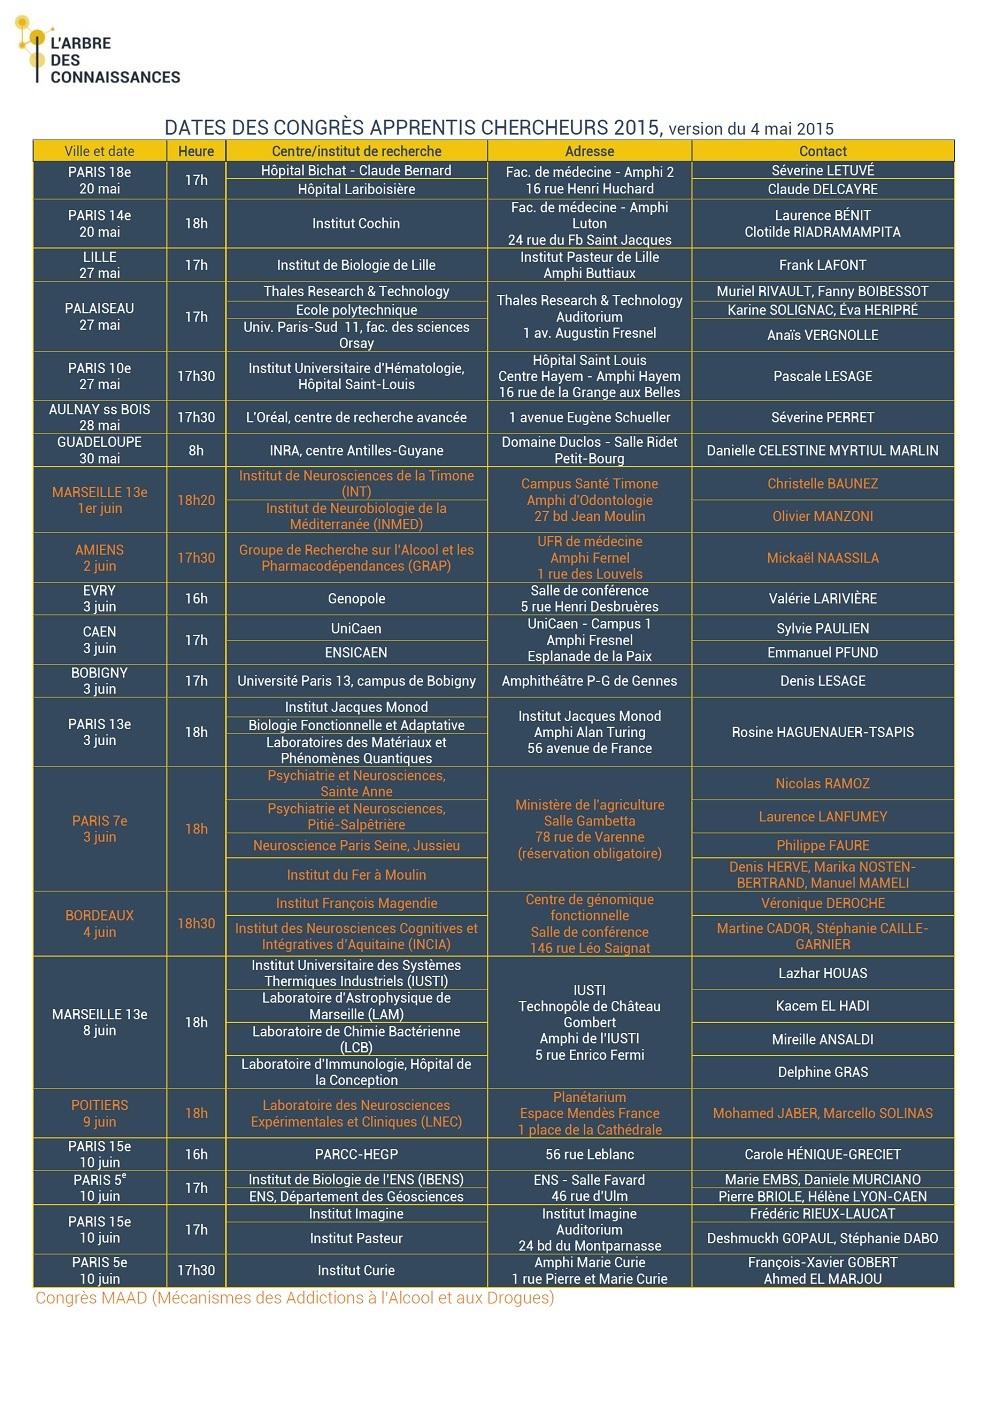 Planning congrès AC total 2015 image_4 mai 1000 px_2